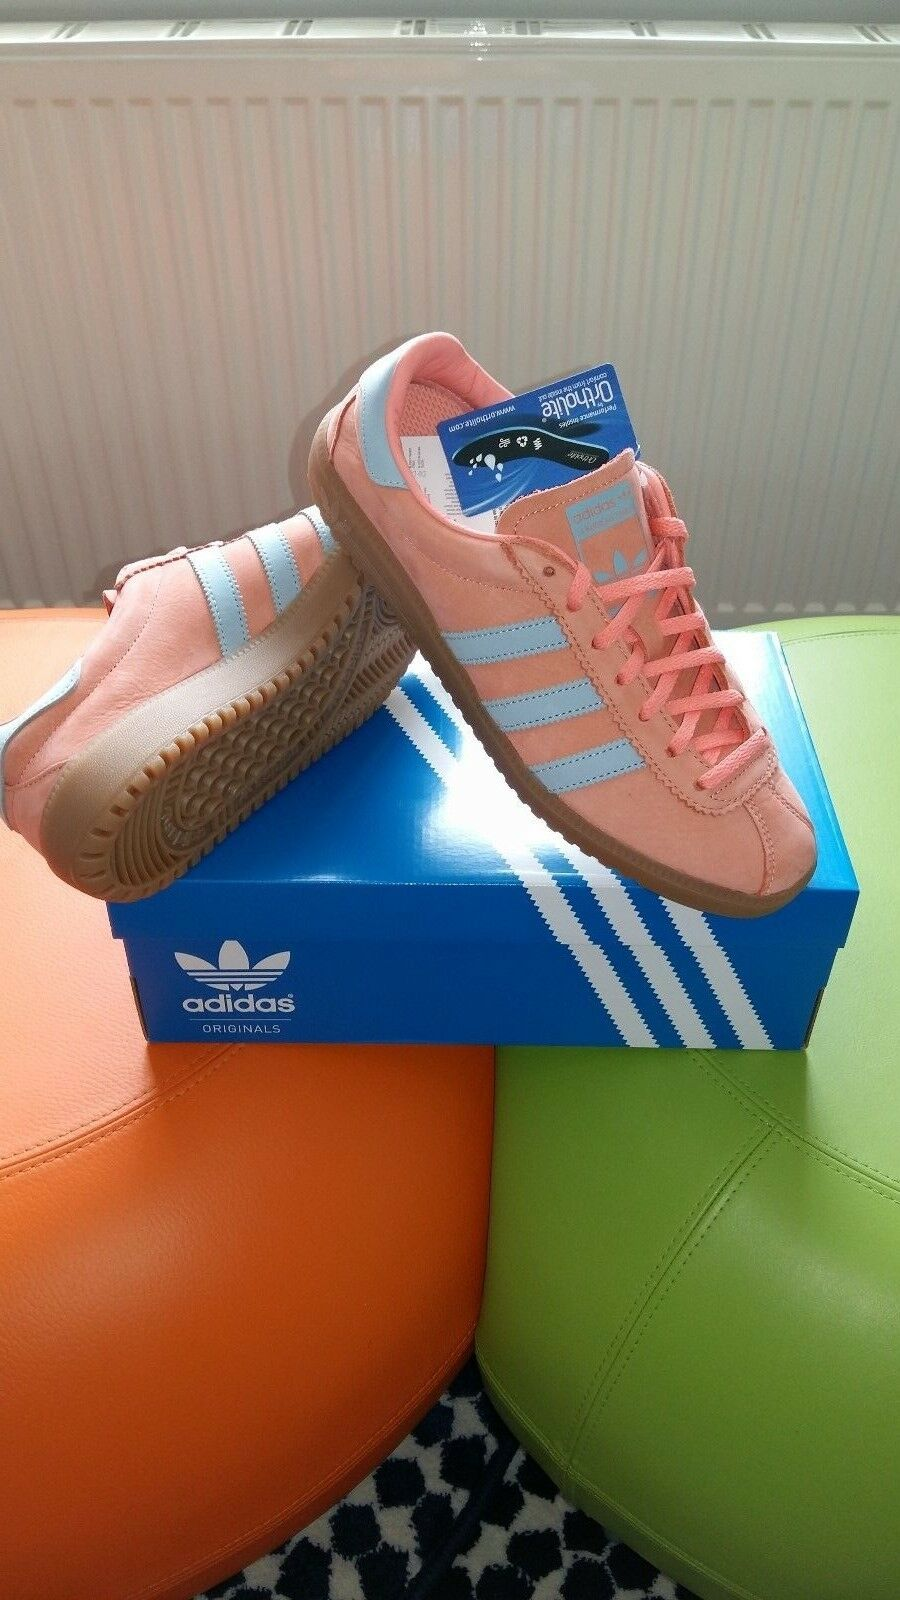 adidas bermuda originals...in coral / ash Gris..  trainers Taille 8 uk eur 42